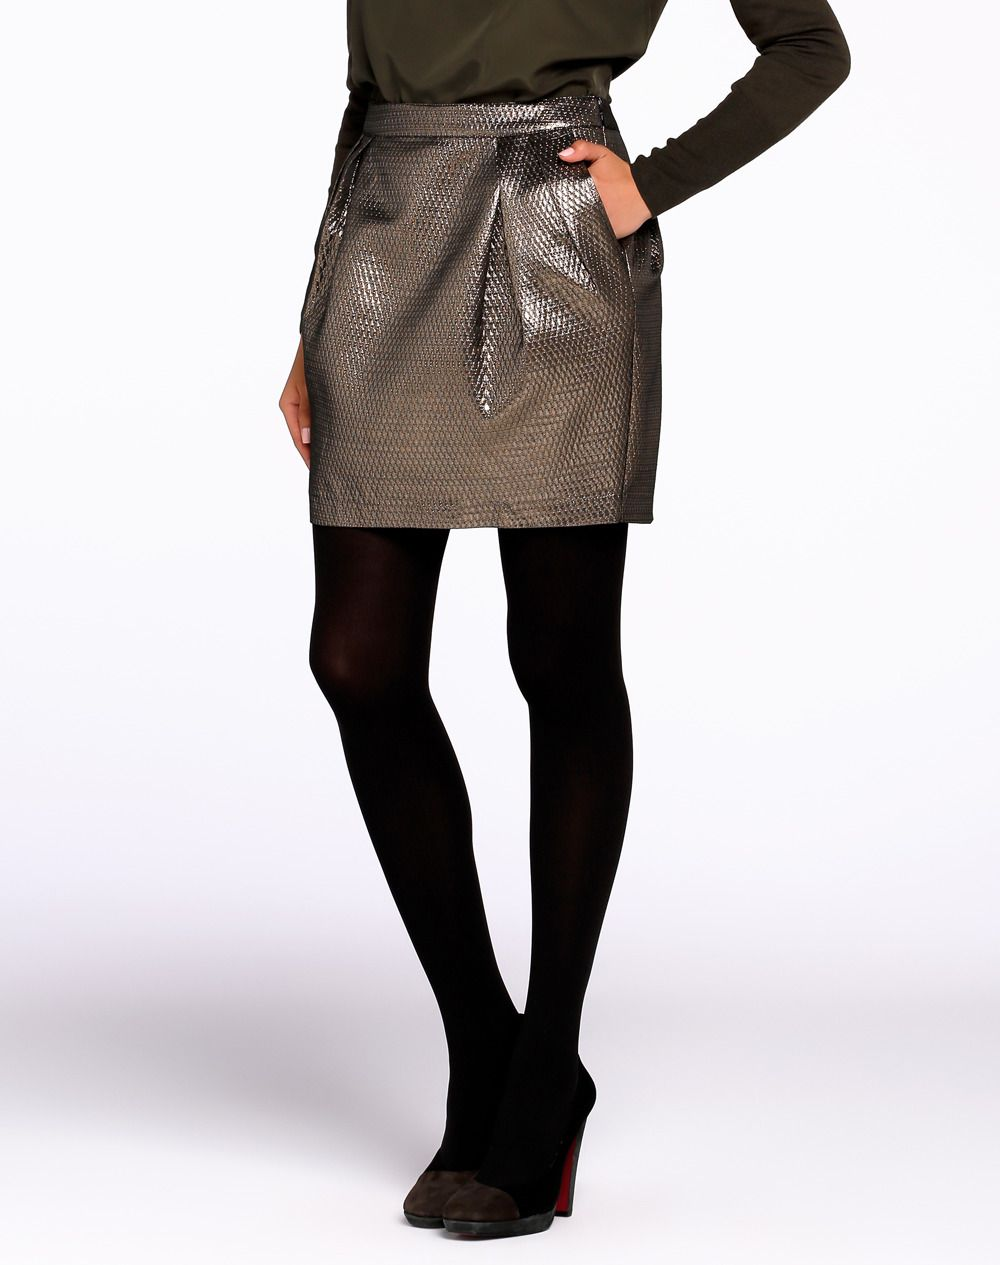 De Mytheresa Guipur Encaje De Minifalda Minifalda OPZiXuk